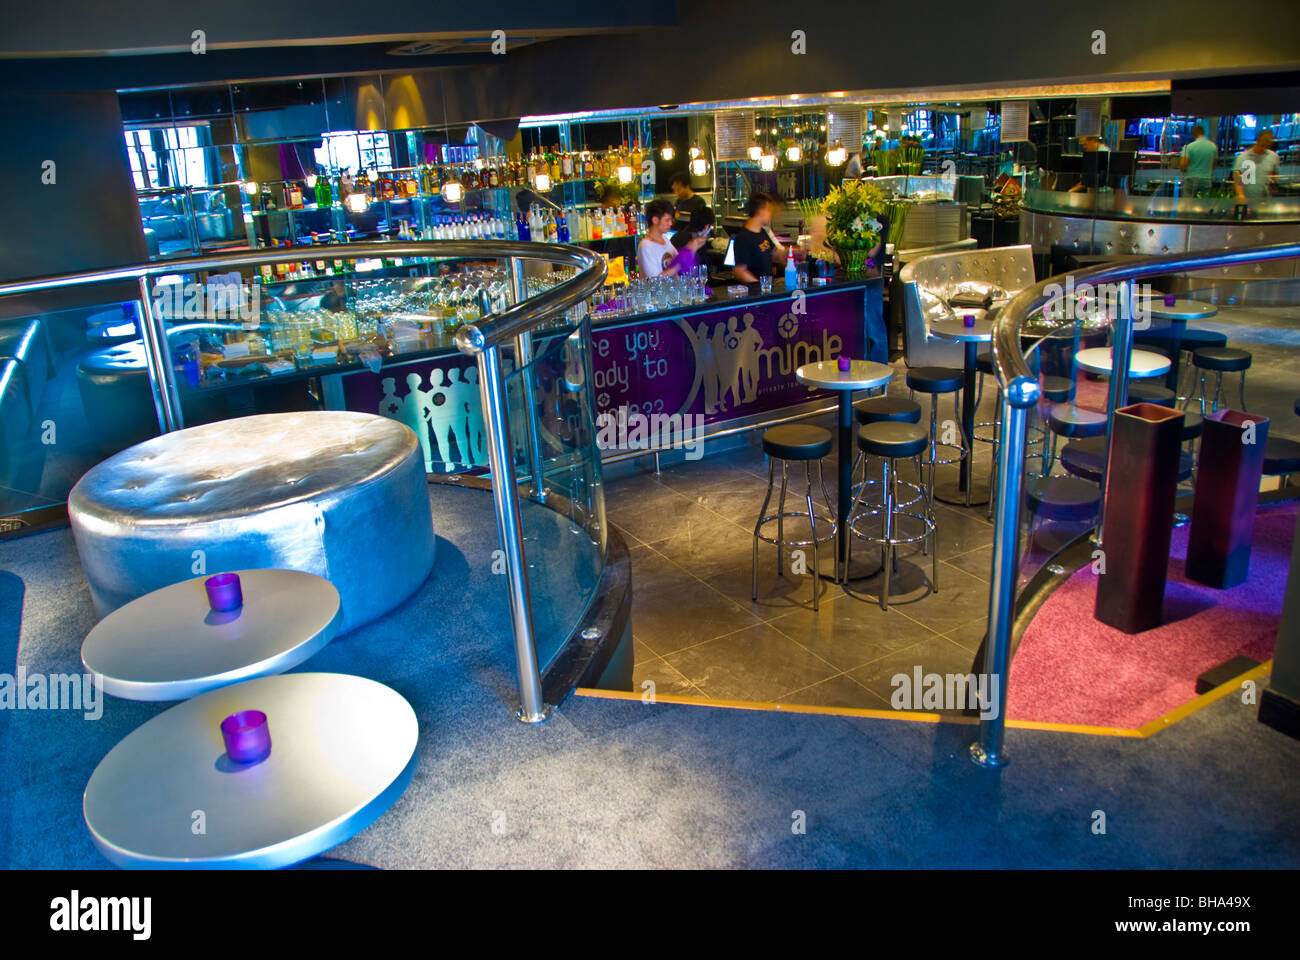 Beijing, CHINA- Interior Nightclub/Lounge/Bar, the Mingle (Under the La Maison de Marquerite Restaurant), Contemporary - Stock Image